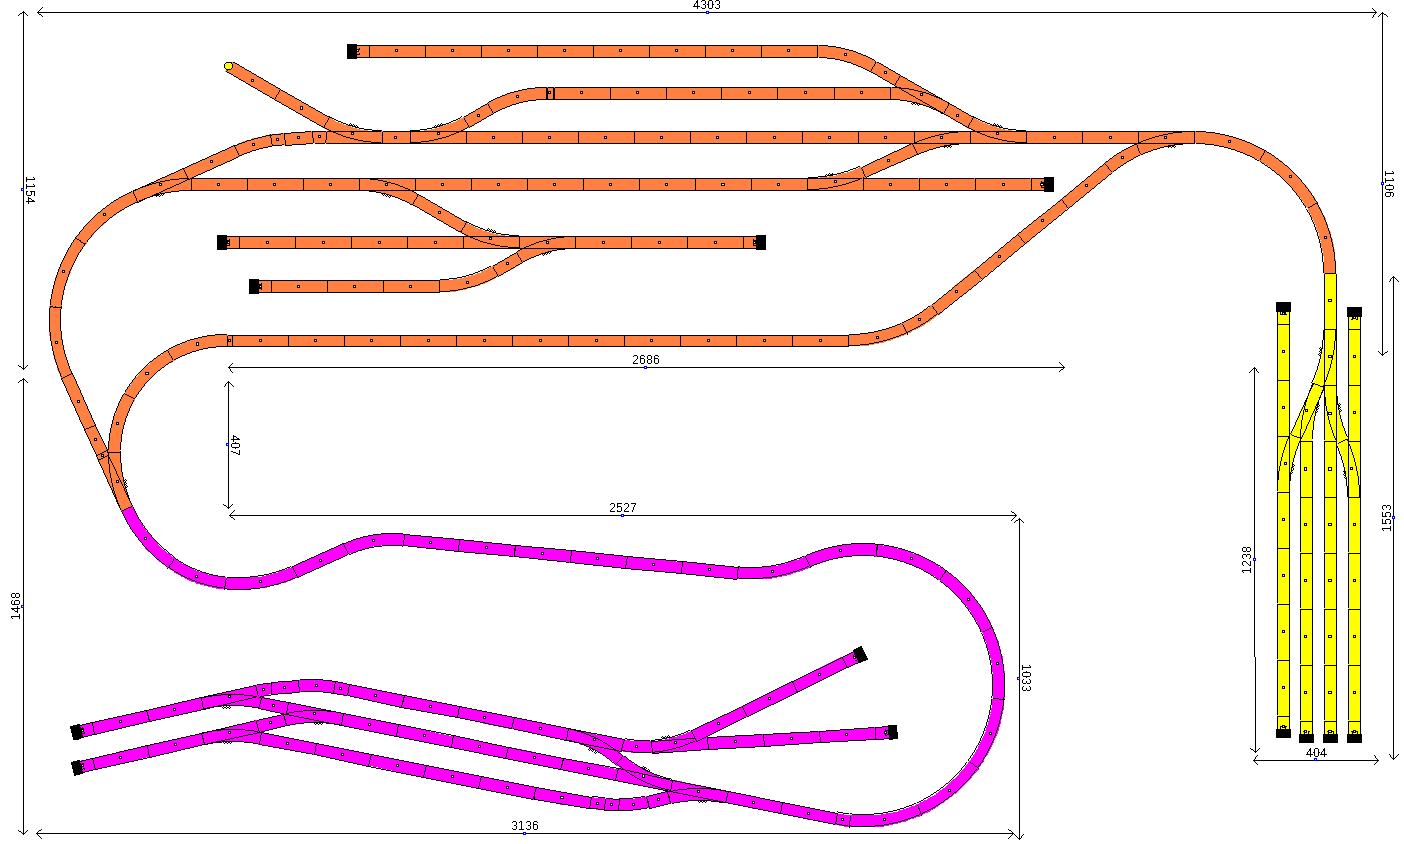 gartenbahn_folge77_uebersicht